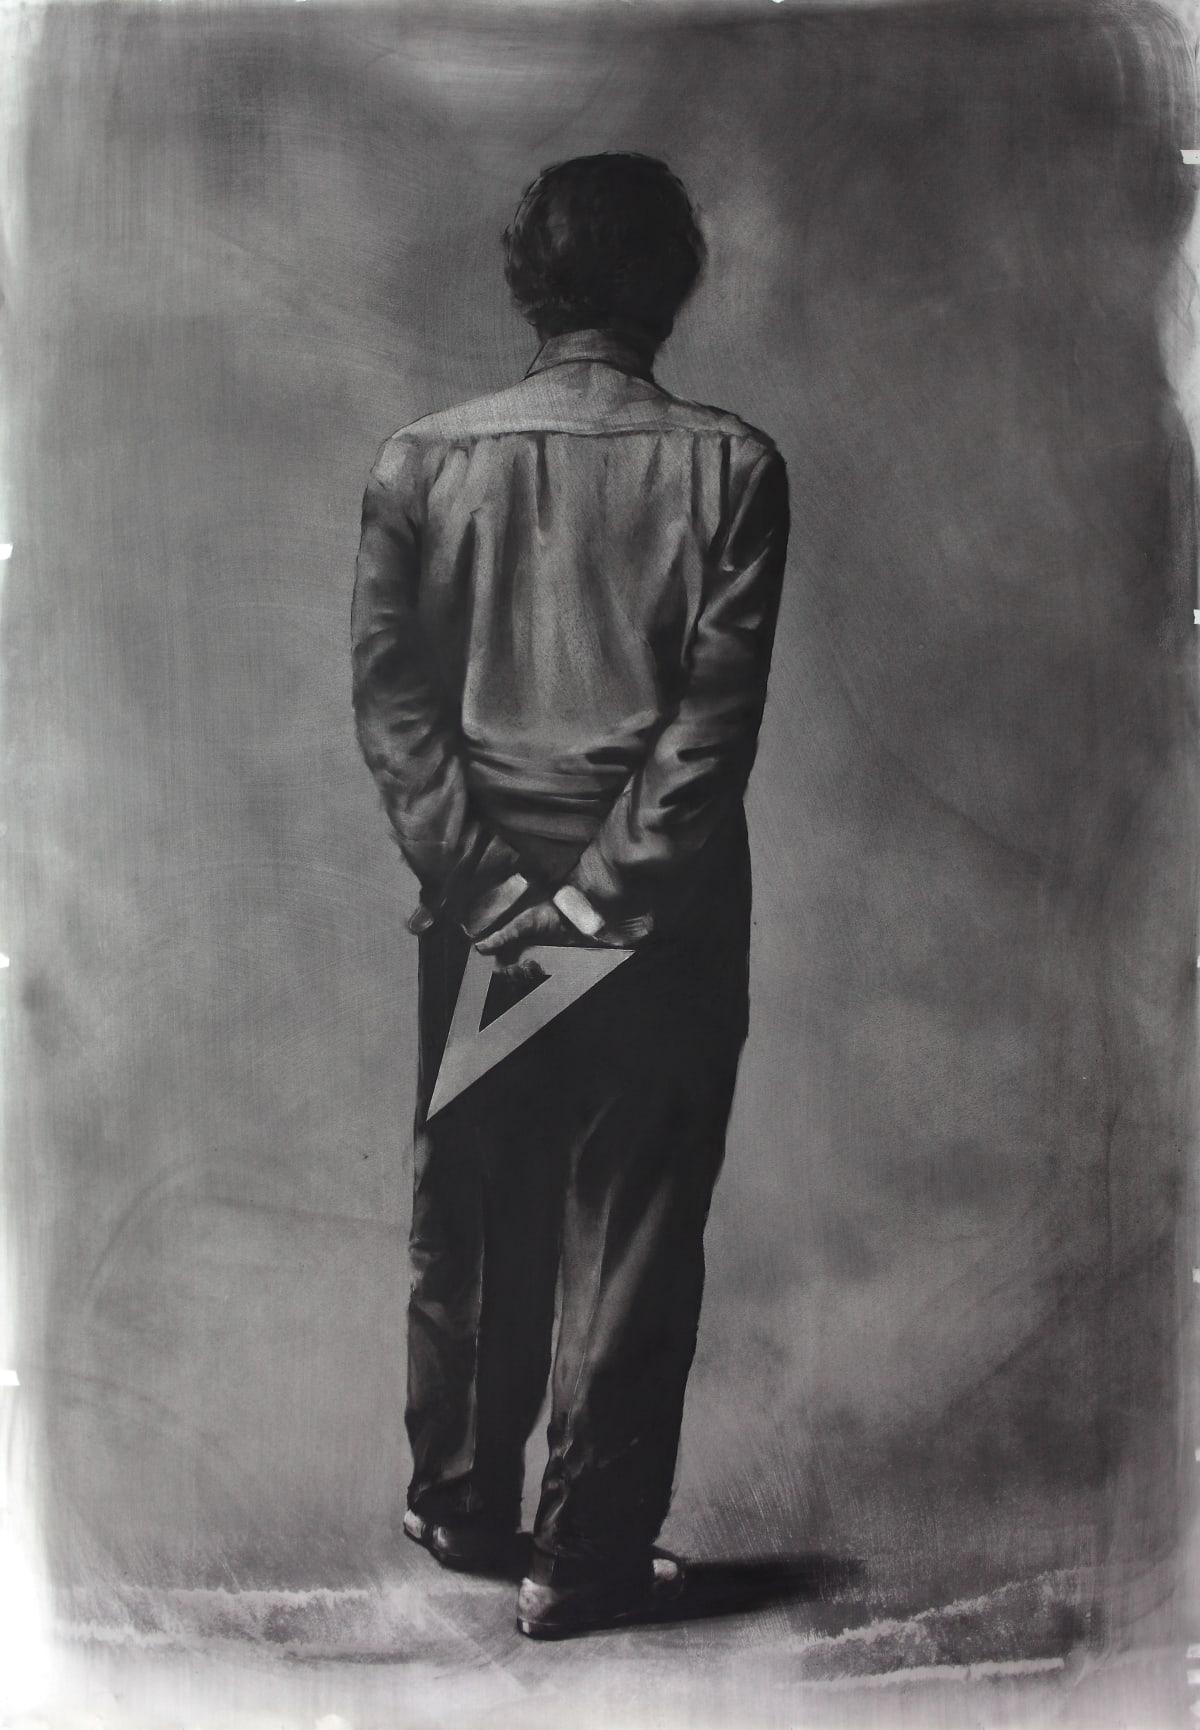 Mircea Suciu, 'Contemplating chaos' 2011 Charcoal on paper, 271 x 150 cm.